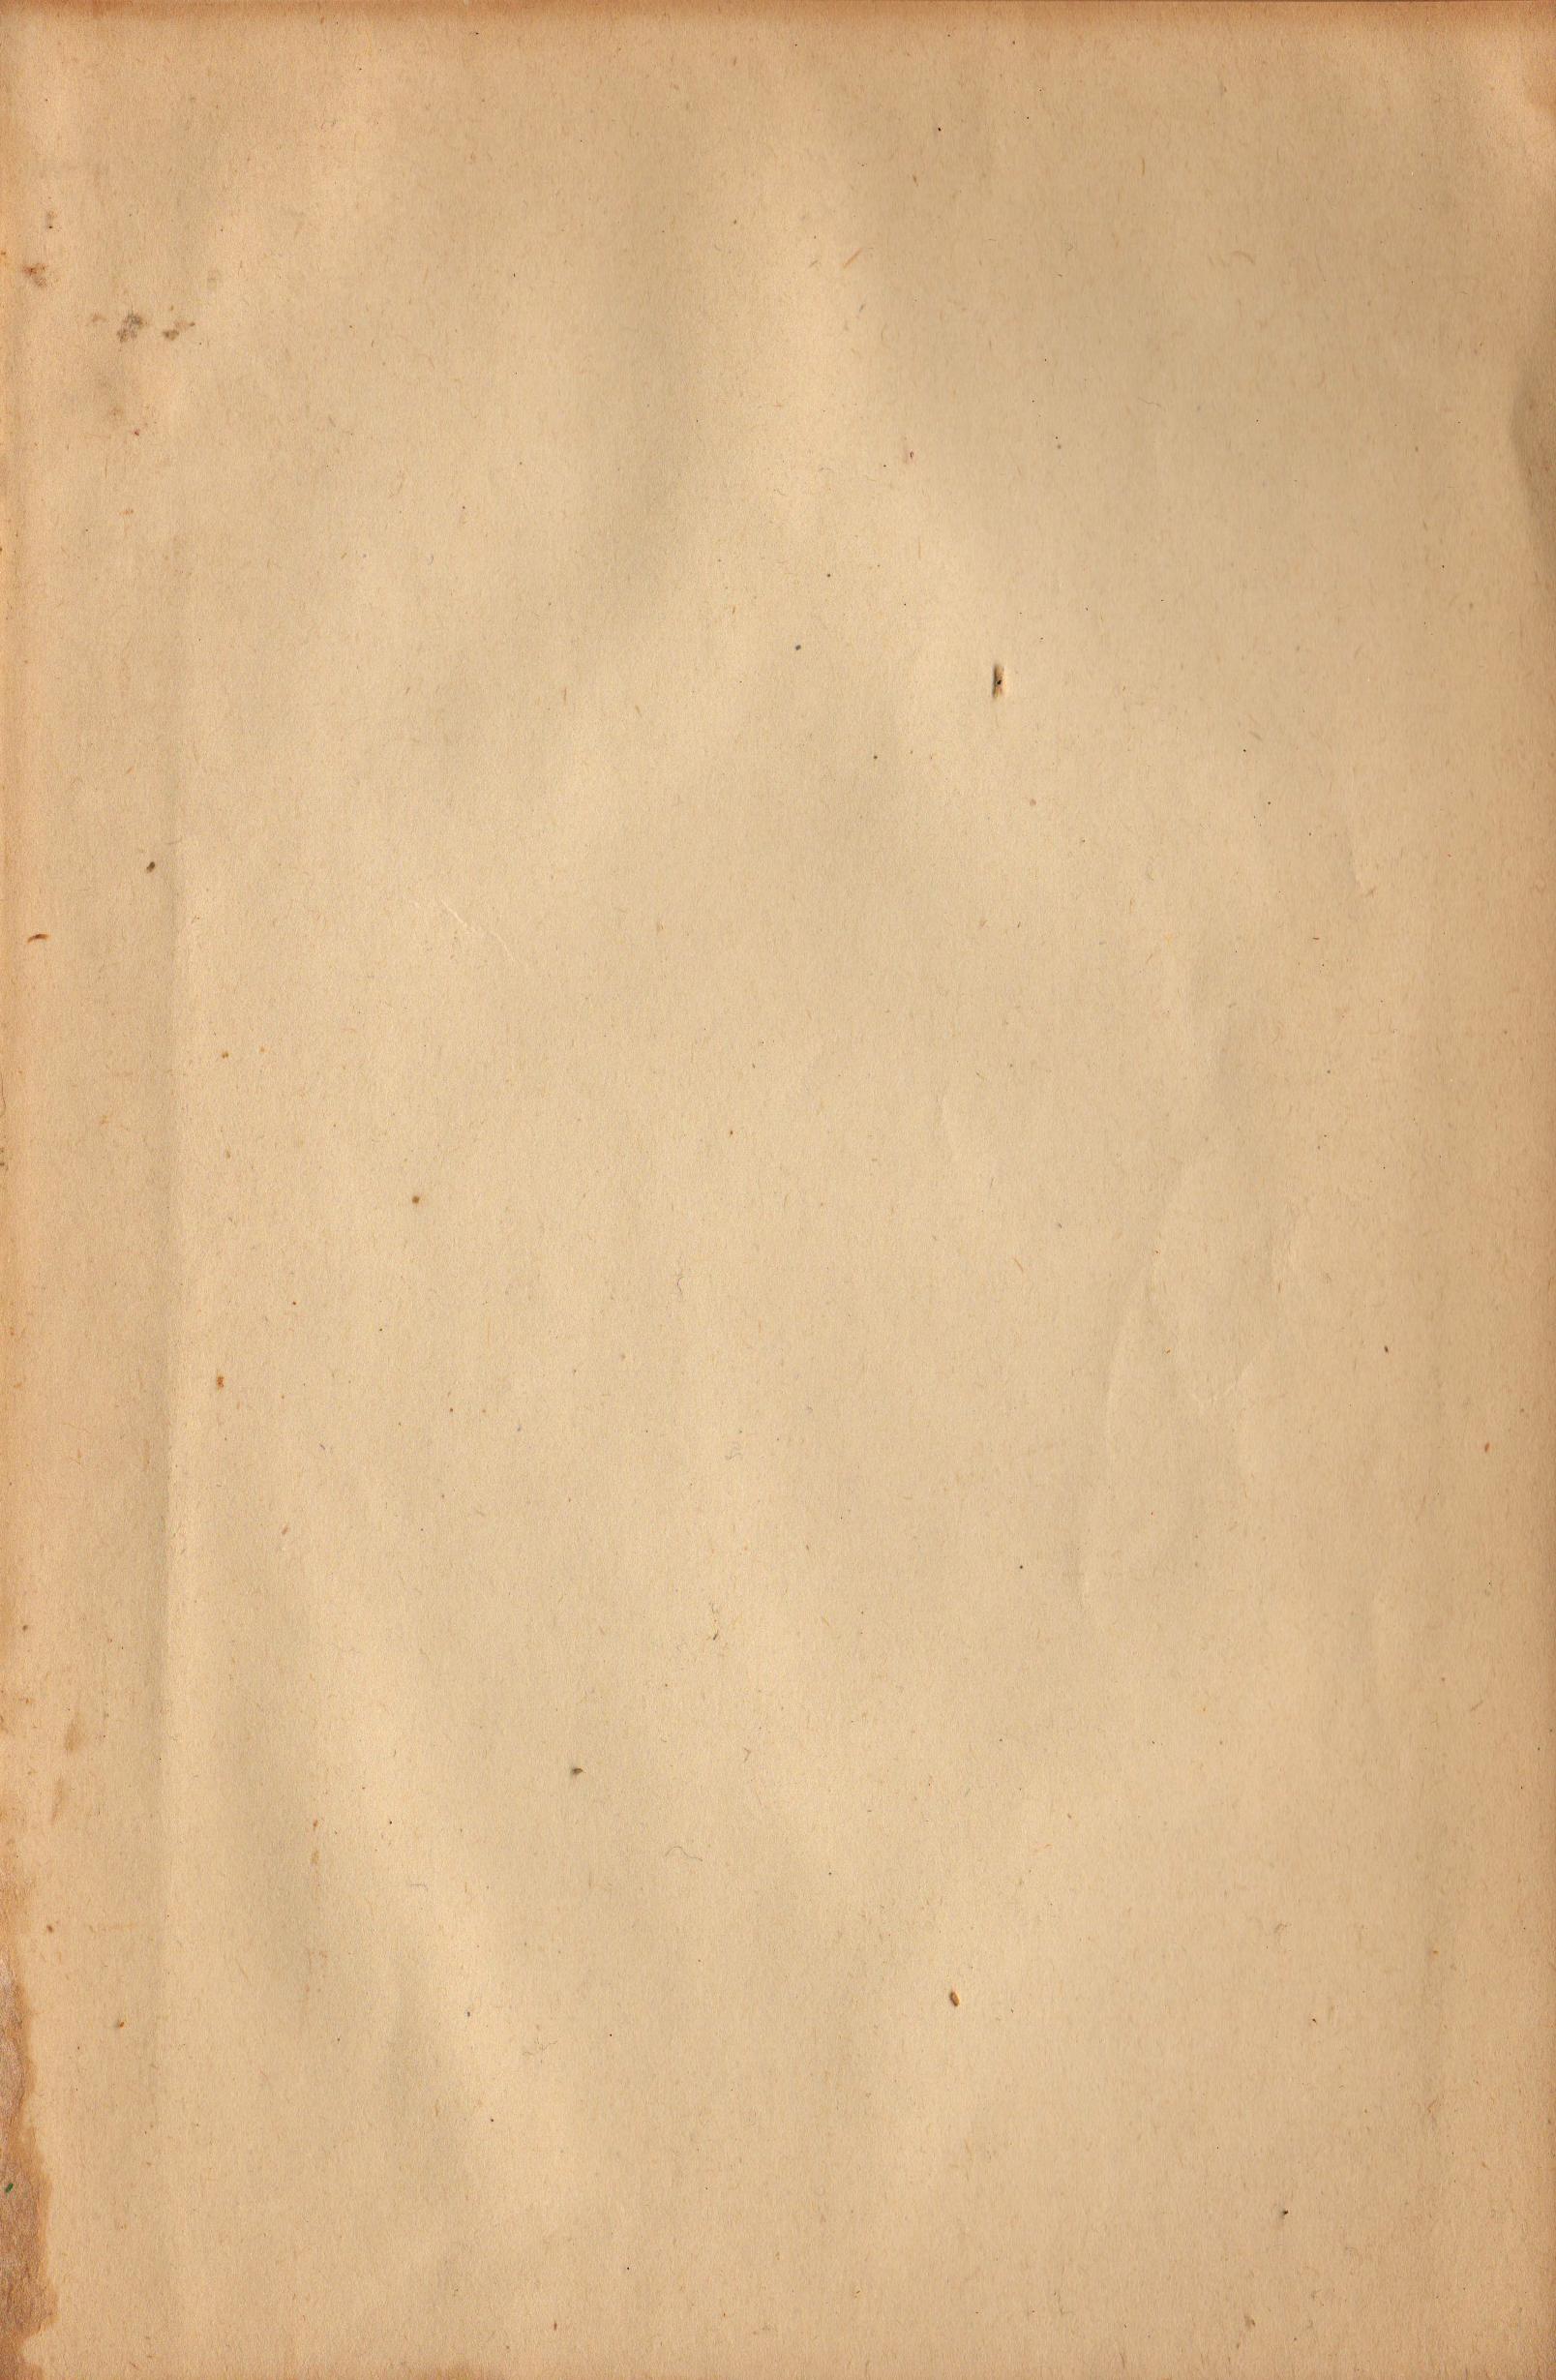 Vintage Paper Background, Blank, Brown, Grunge, Old, HQ Photo